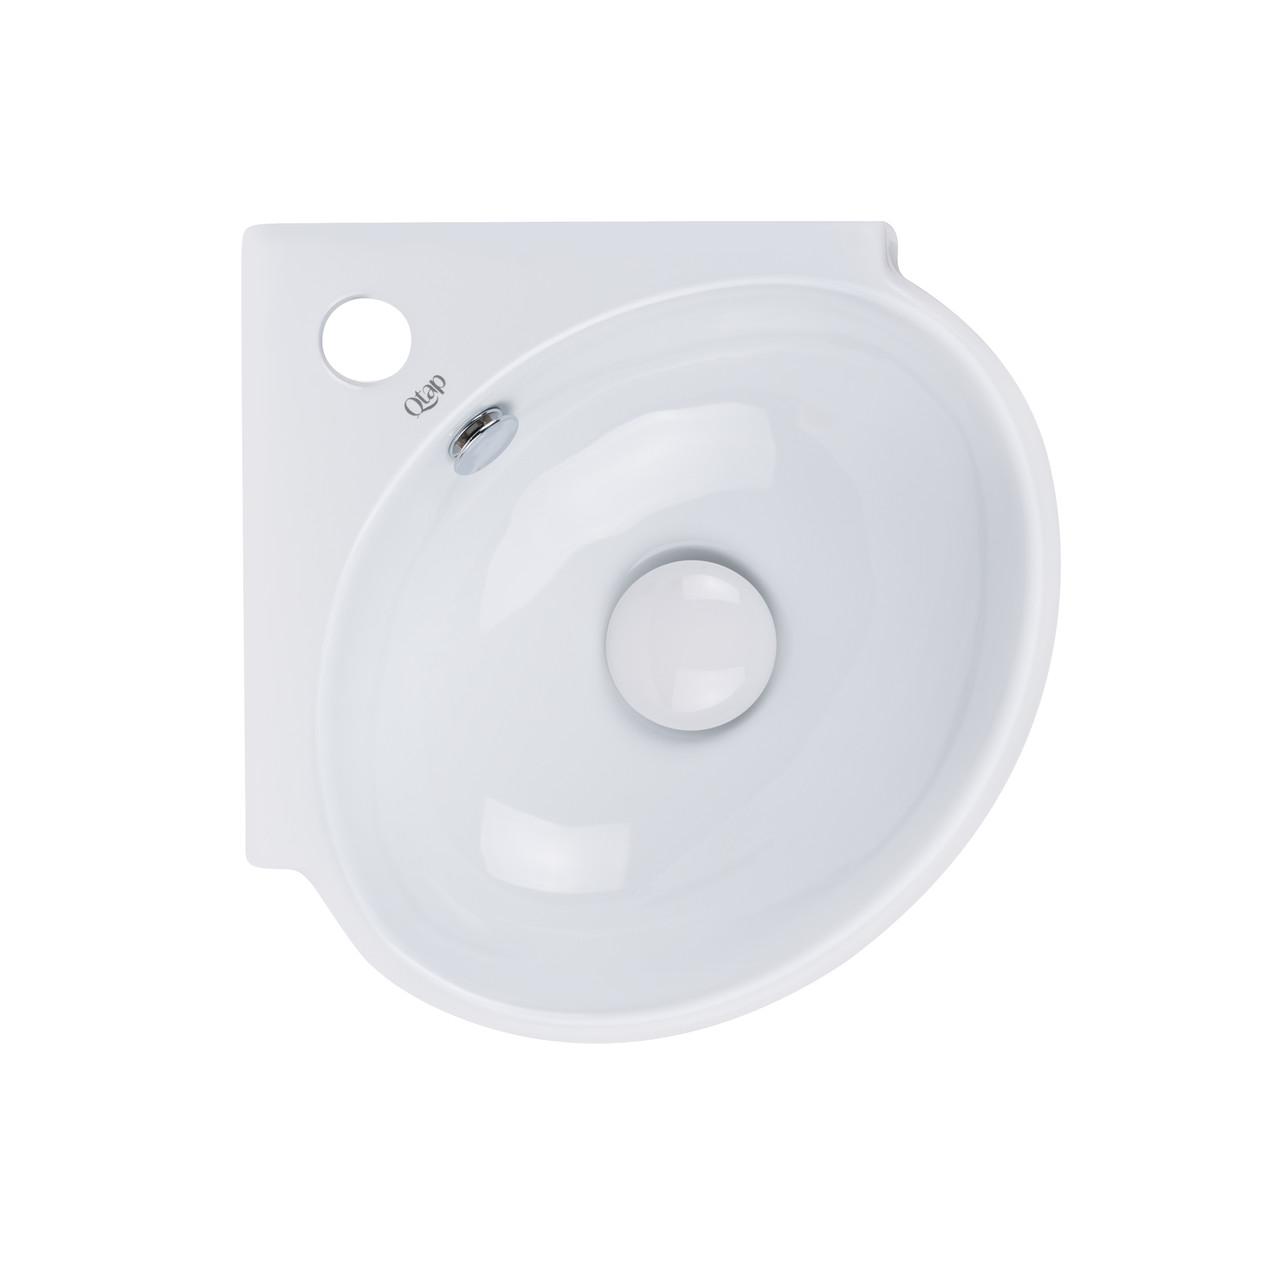 Раковина Qtap Leo 390x365x130 White с донным клапаном QT11115010W